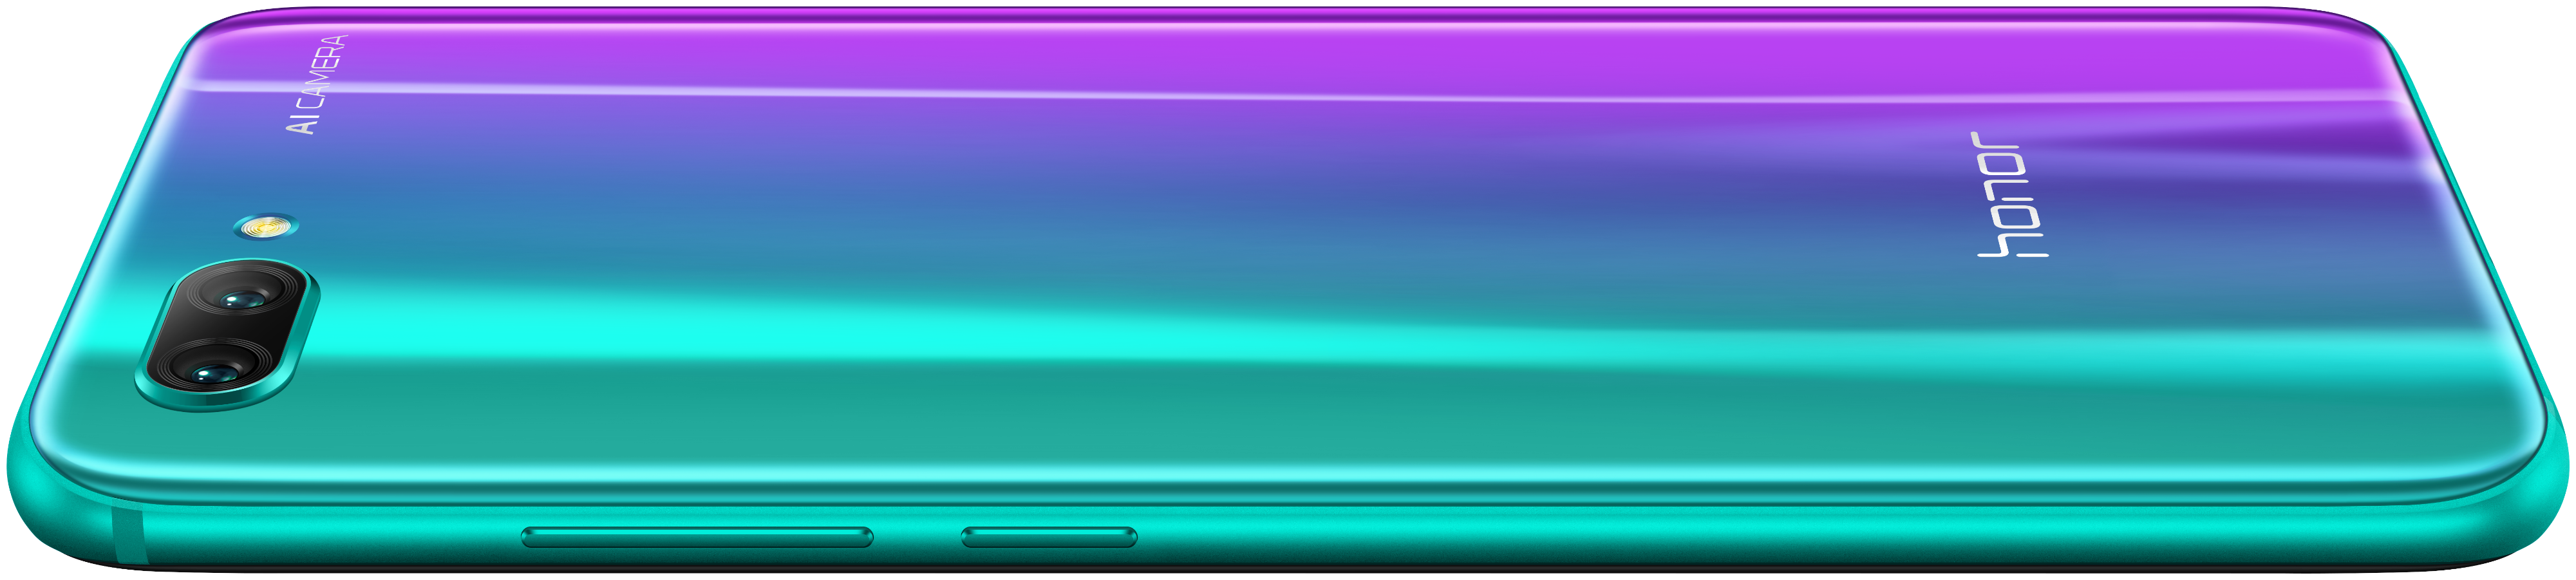 HONOR 10 4/64GB - операционная система: Android 8.1